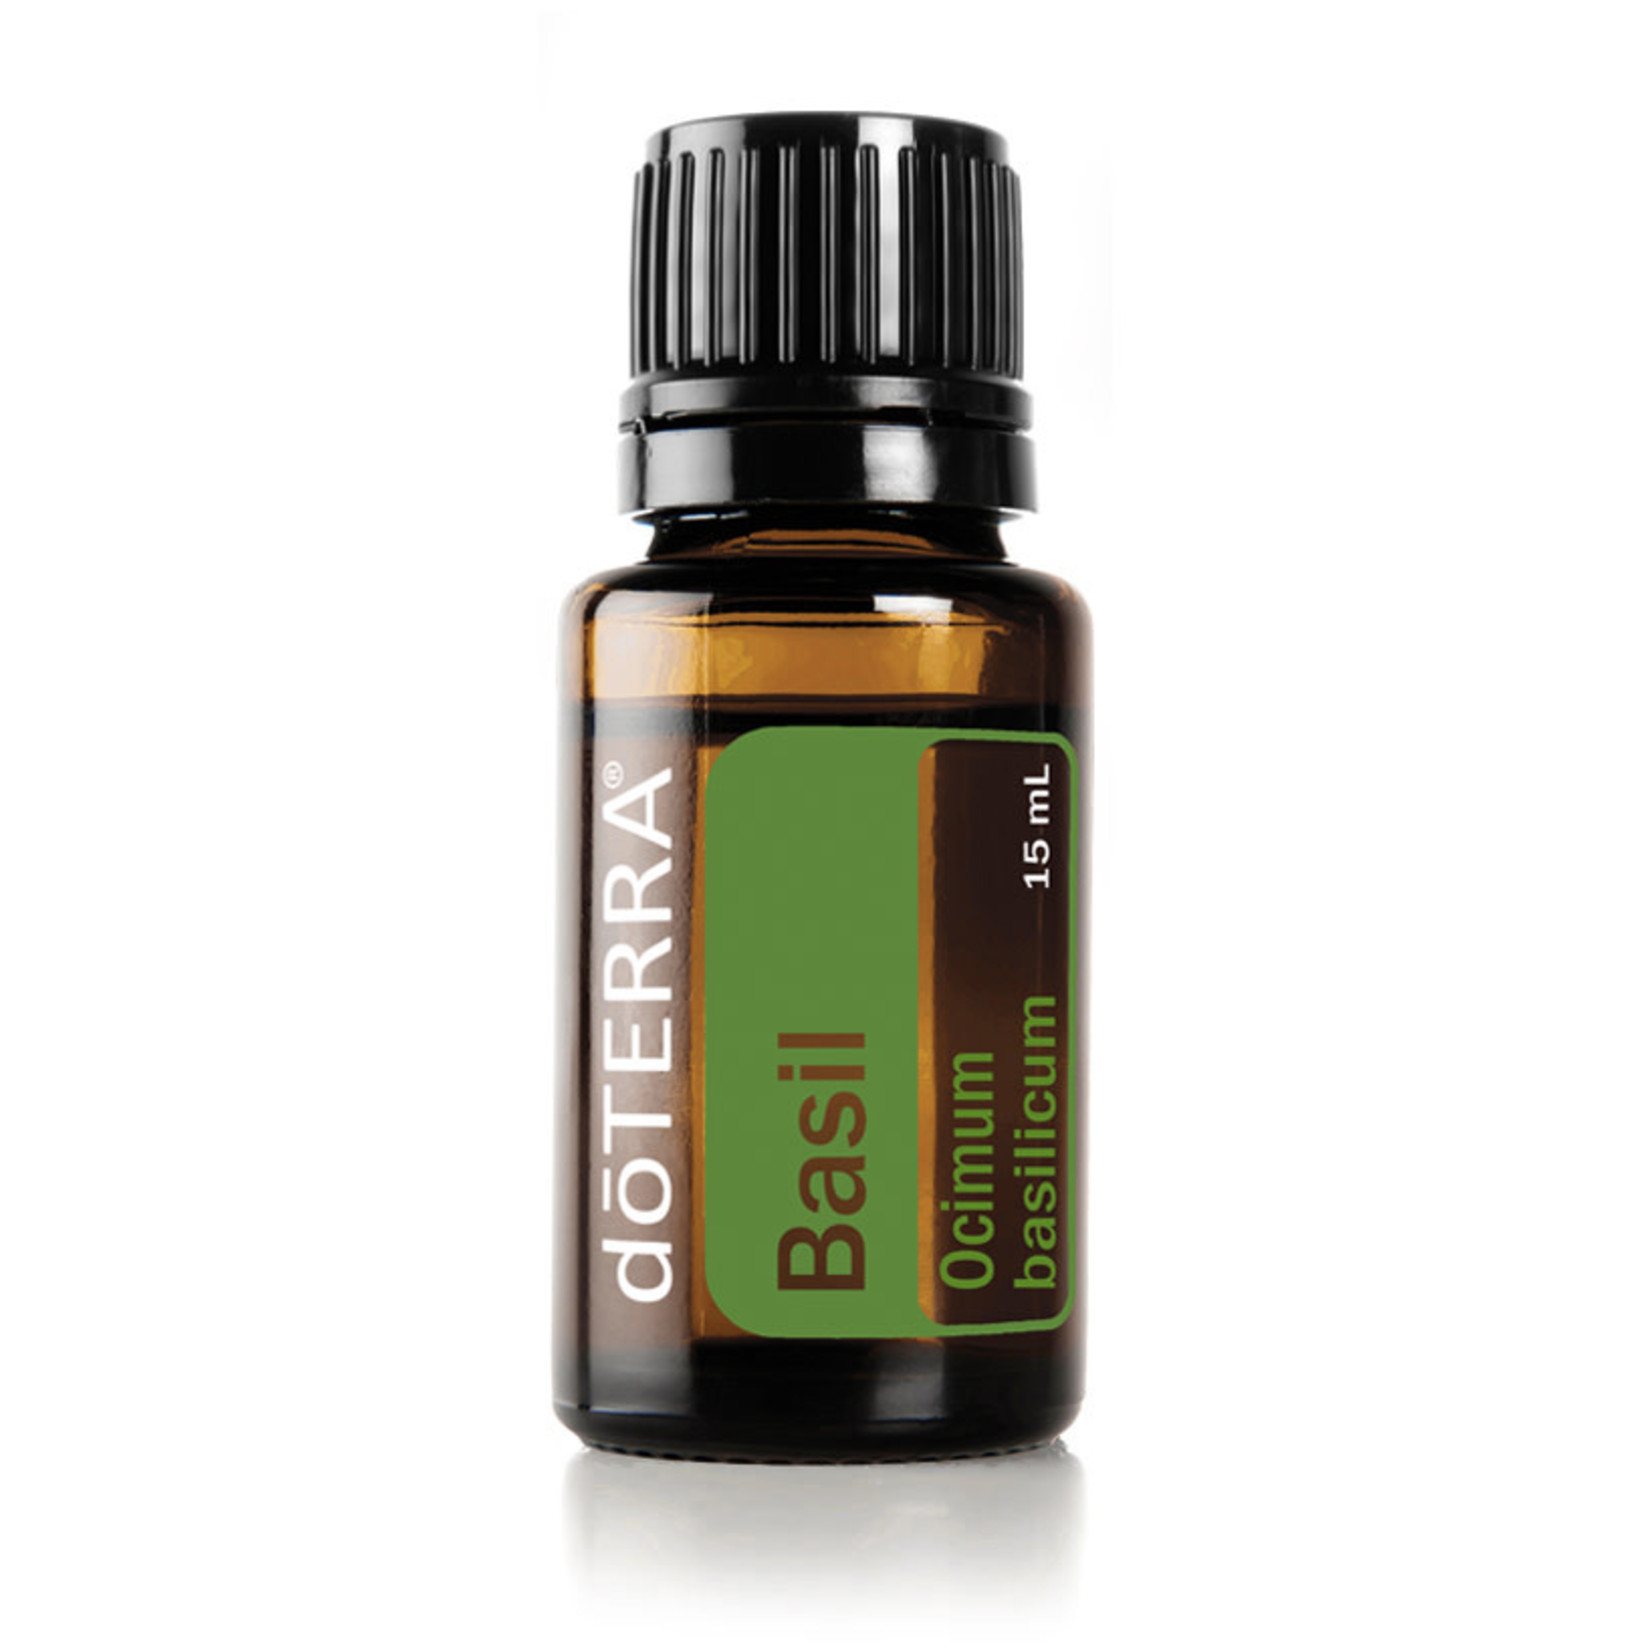 doTERRA doTERRA Essential Oil Basil 15ml